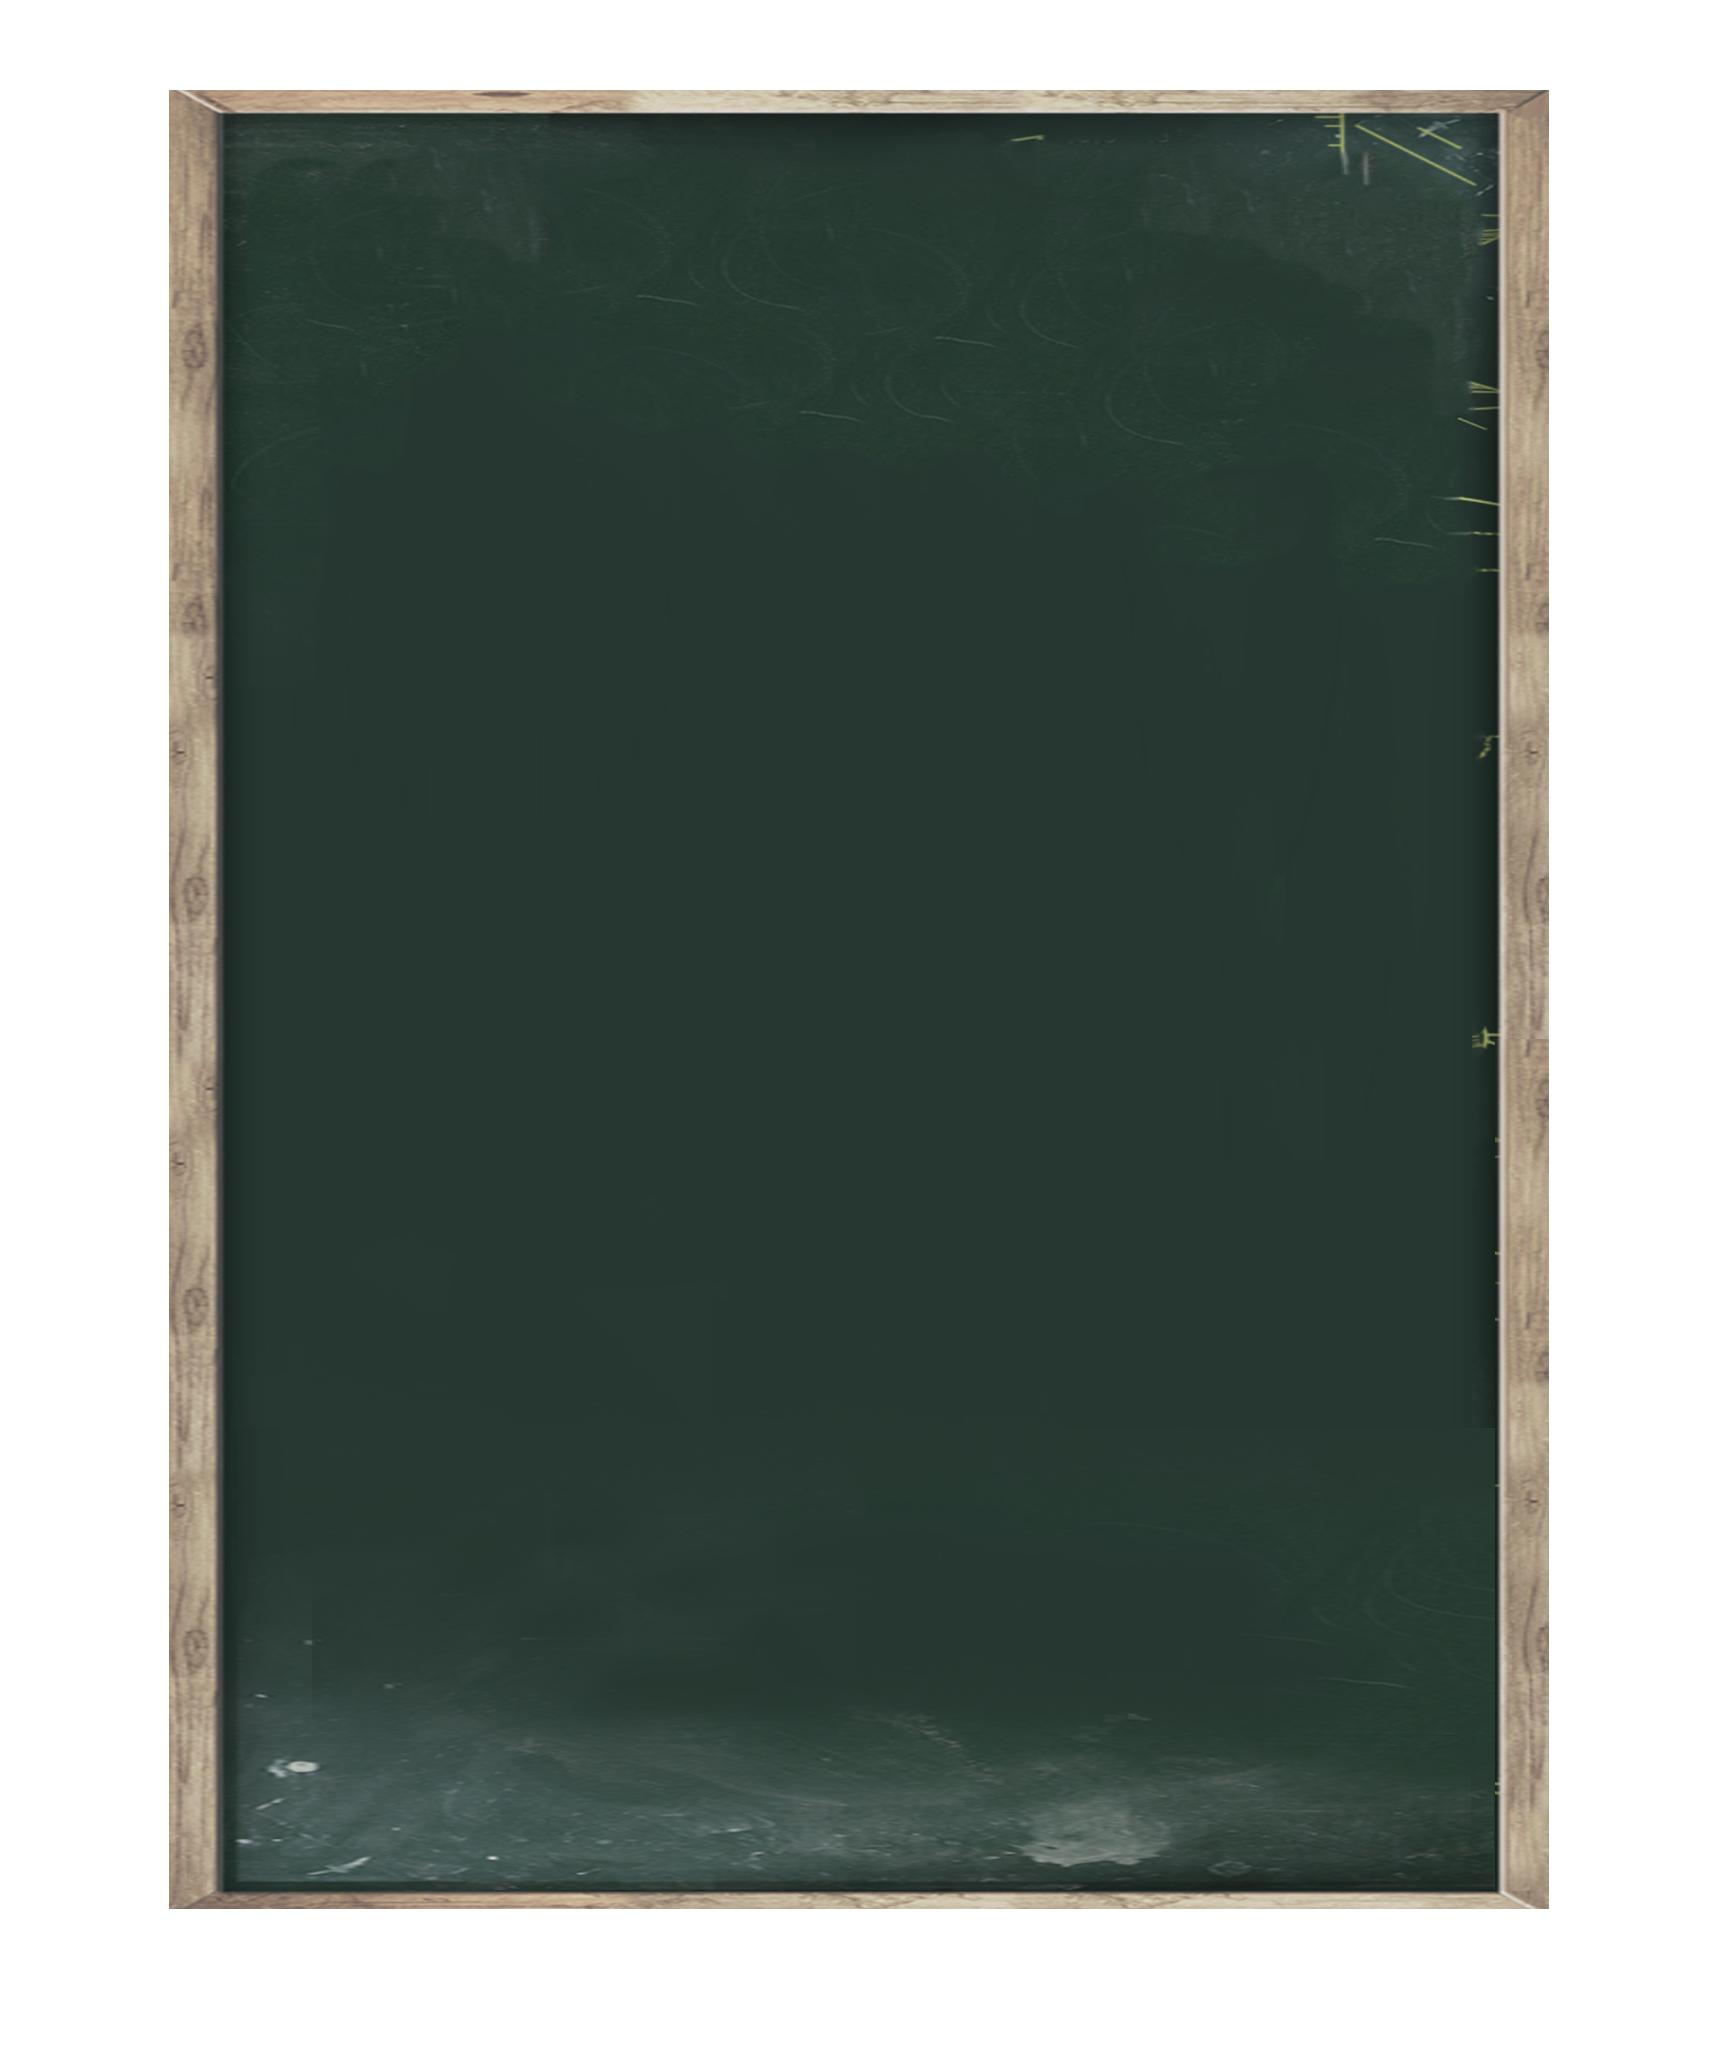 Green picture blackboard transprent. Chalkboard frame png